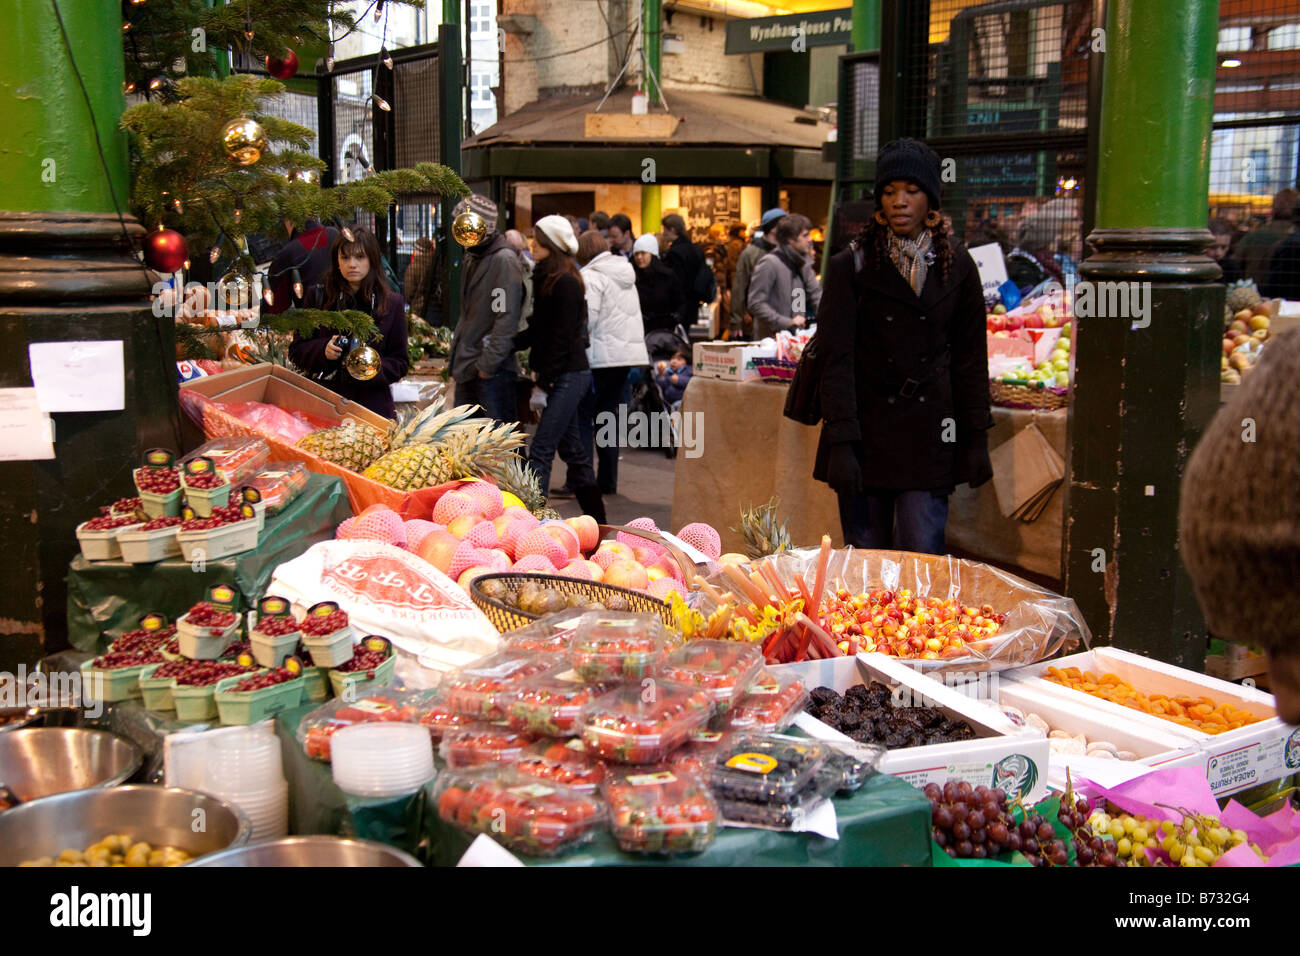 Vegetable stall at Borough market London England. - Stock Image